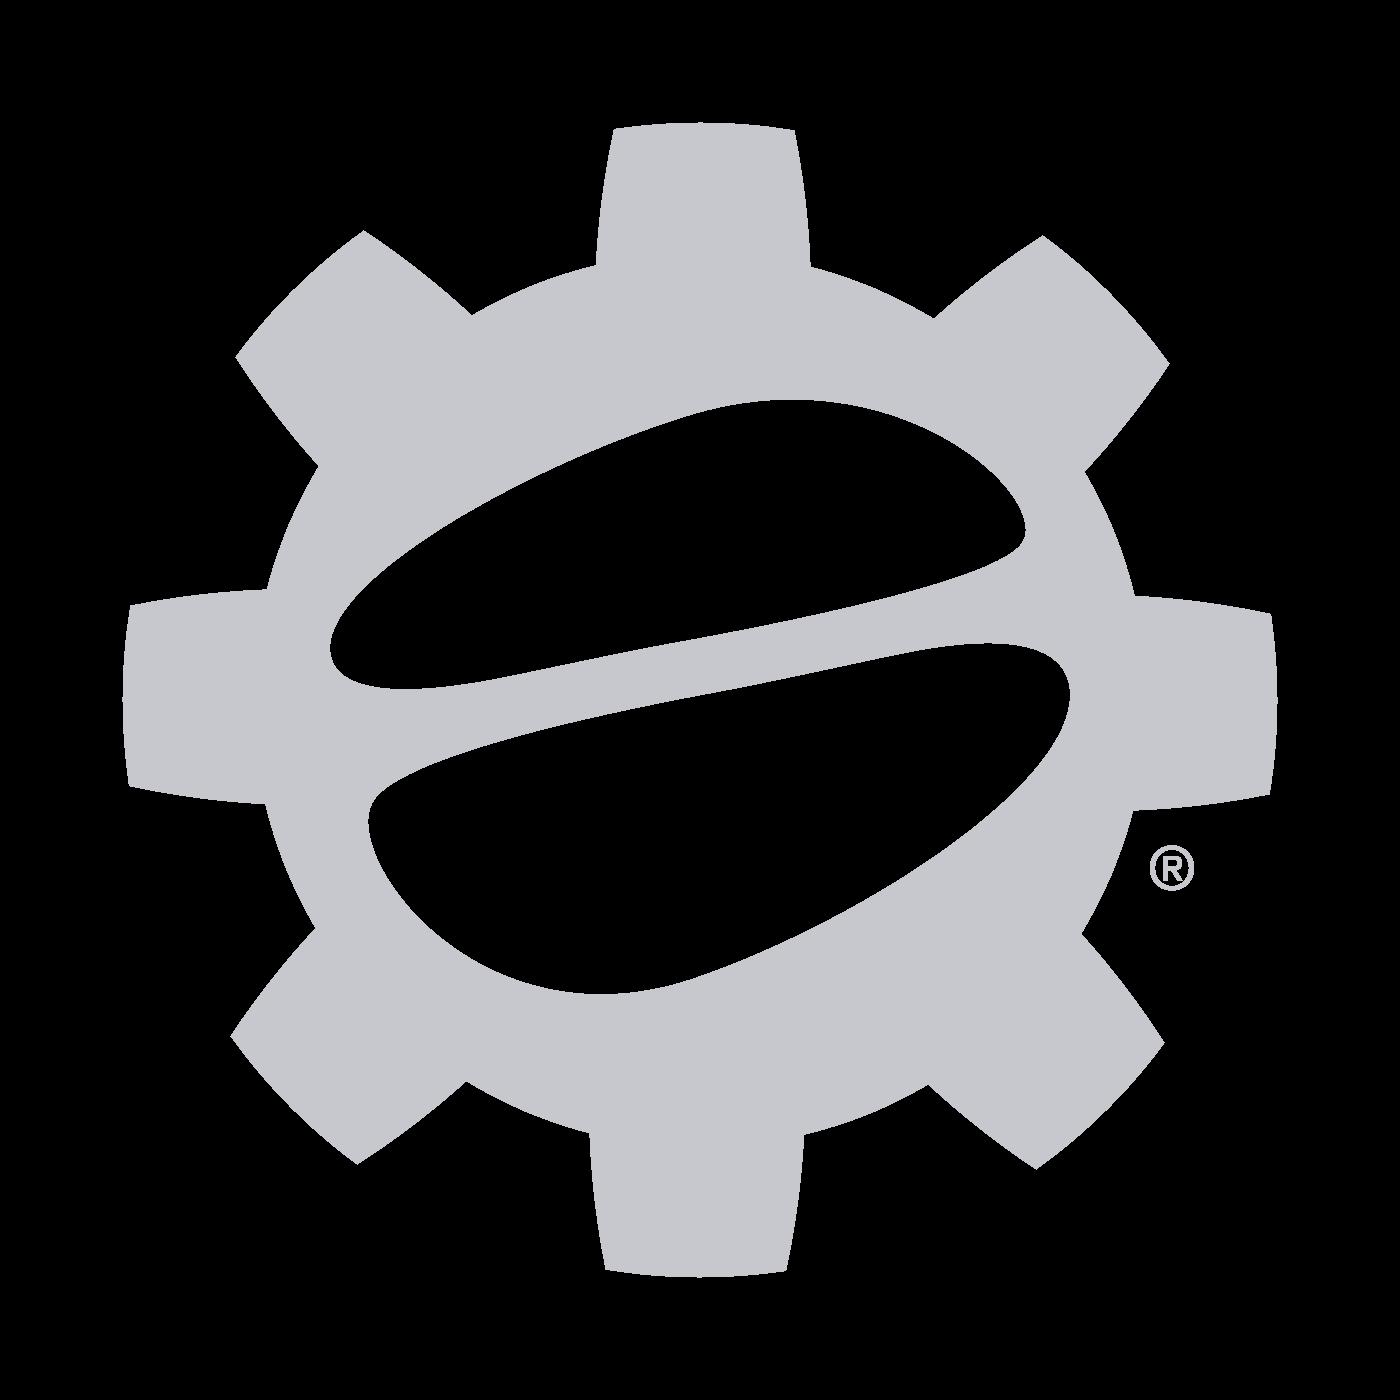 Rattleware Maple Hardwood Knockbox with Stainless Insert